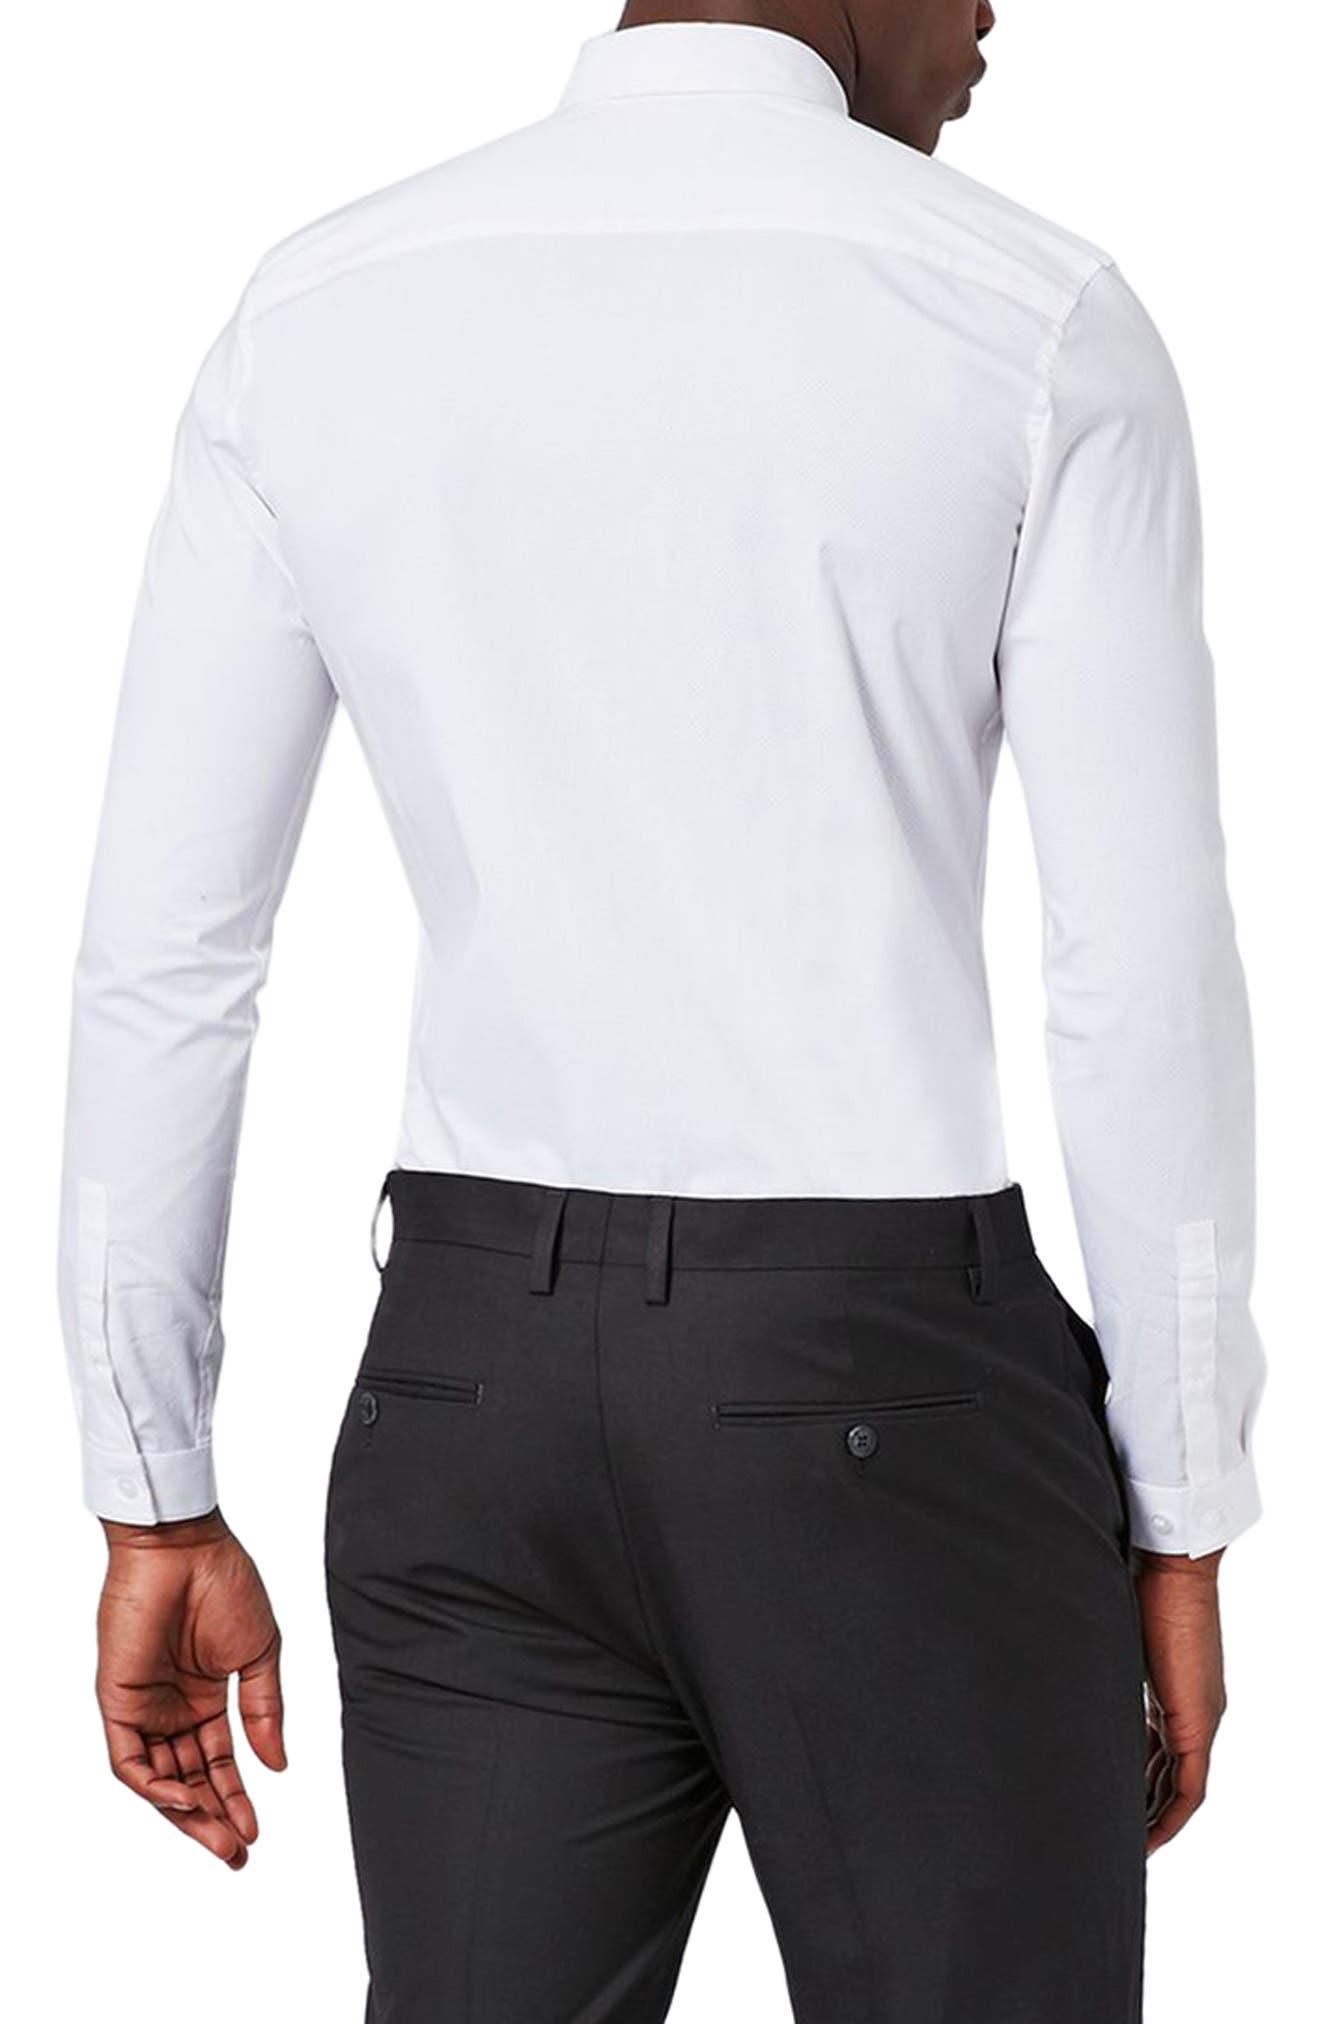 Muscle Fit Polka Dot Shirt,                             Alternate thumbnail 2, color,                             White